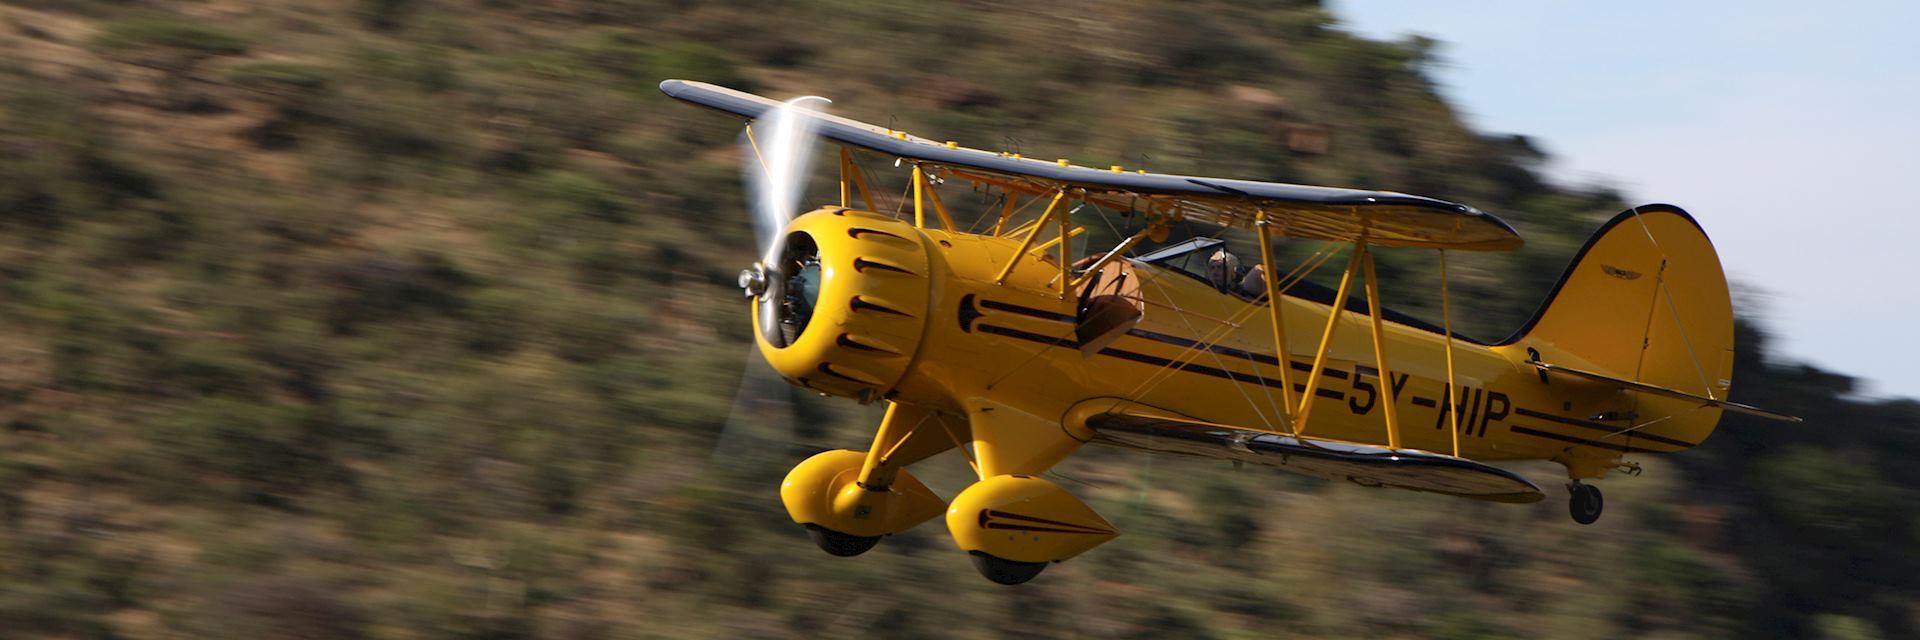 Biplane, Lewa Conservancy